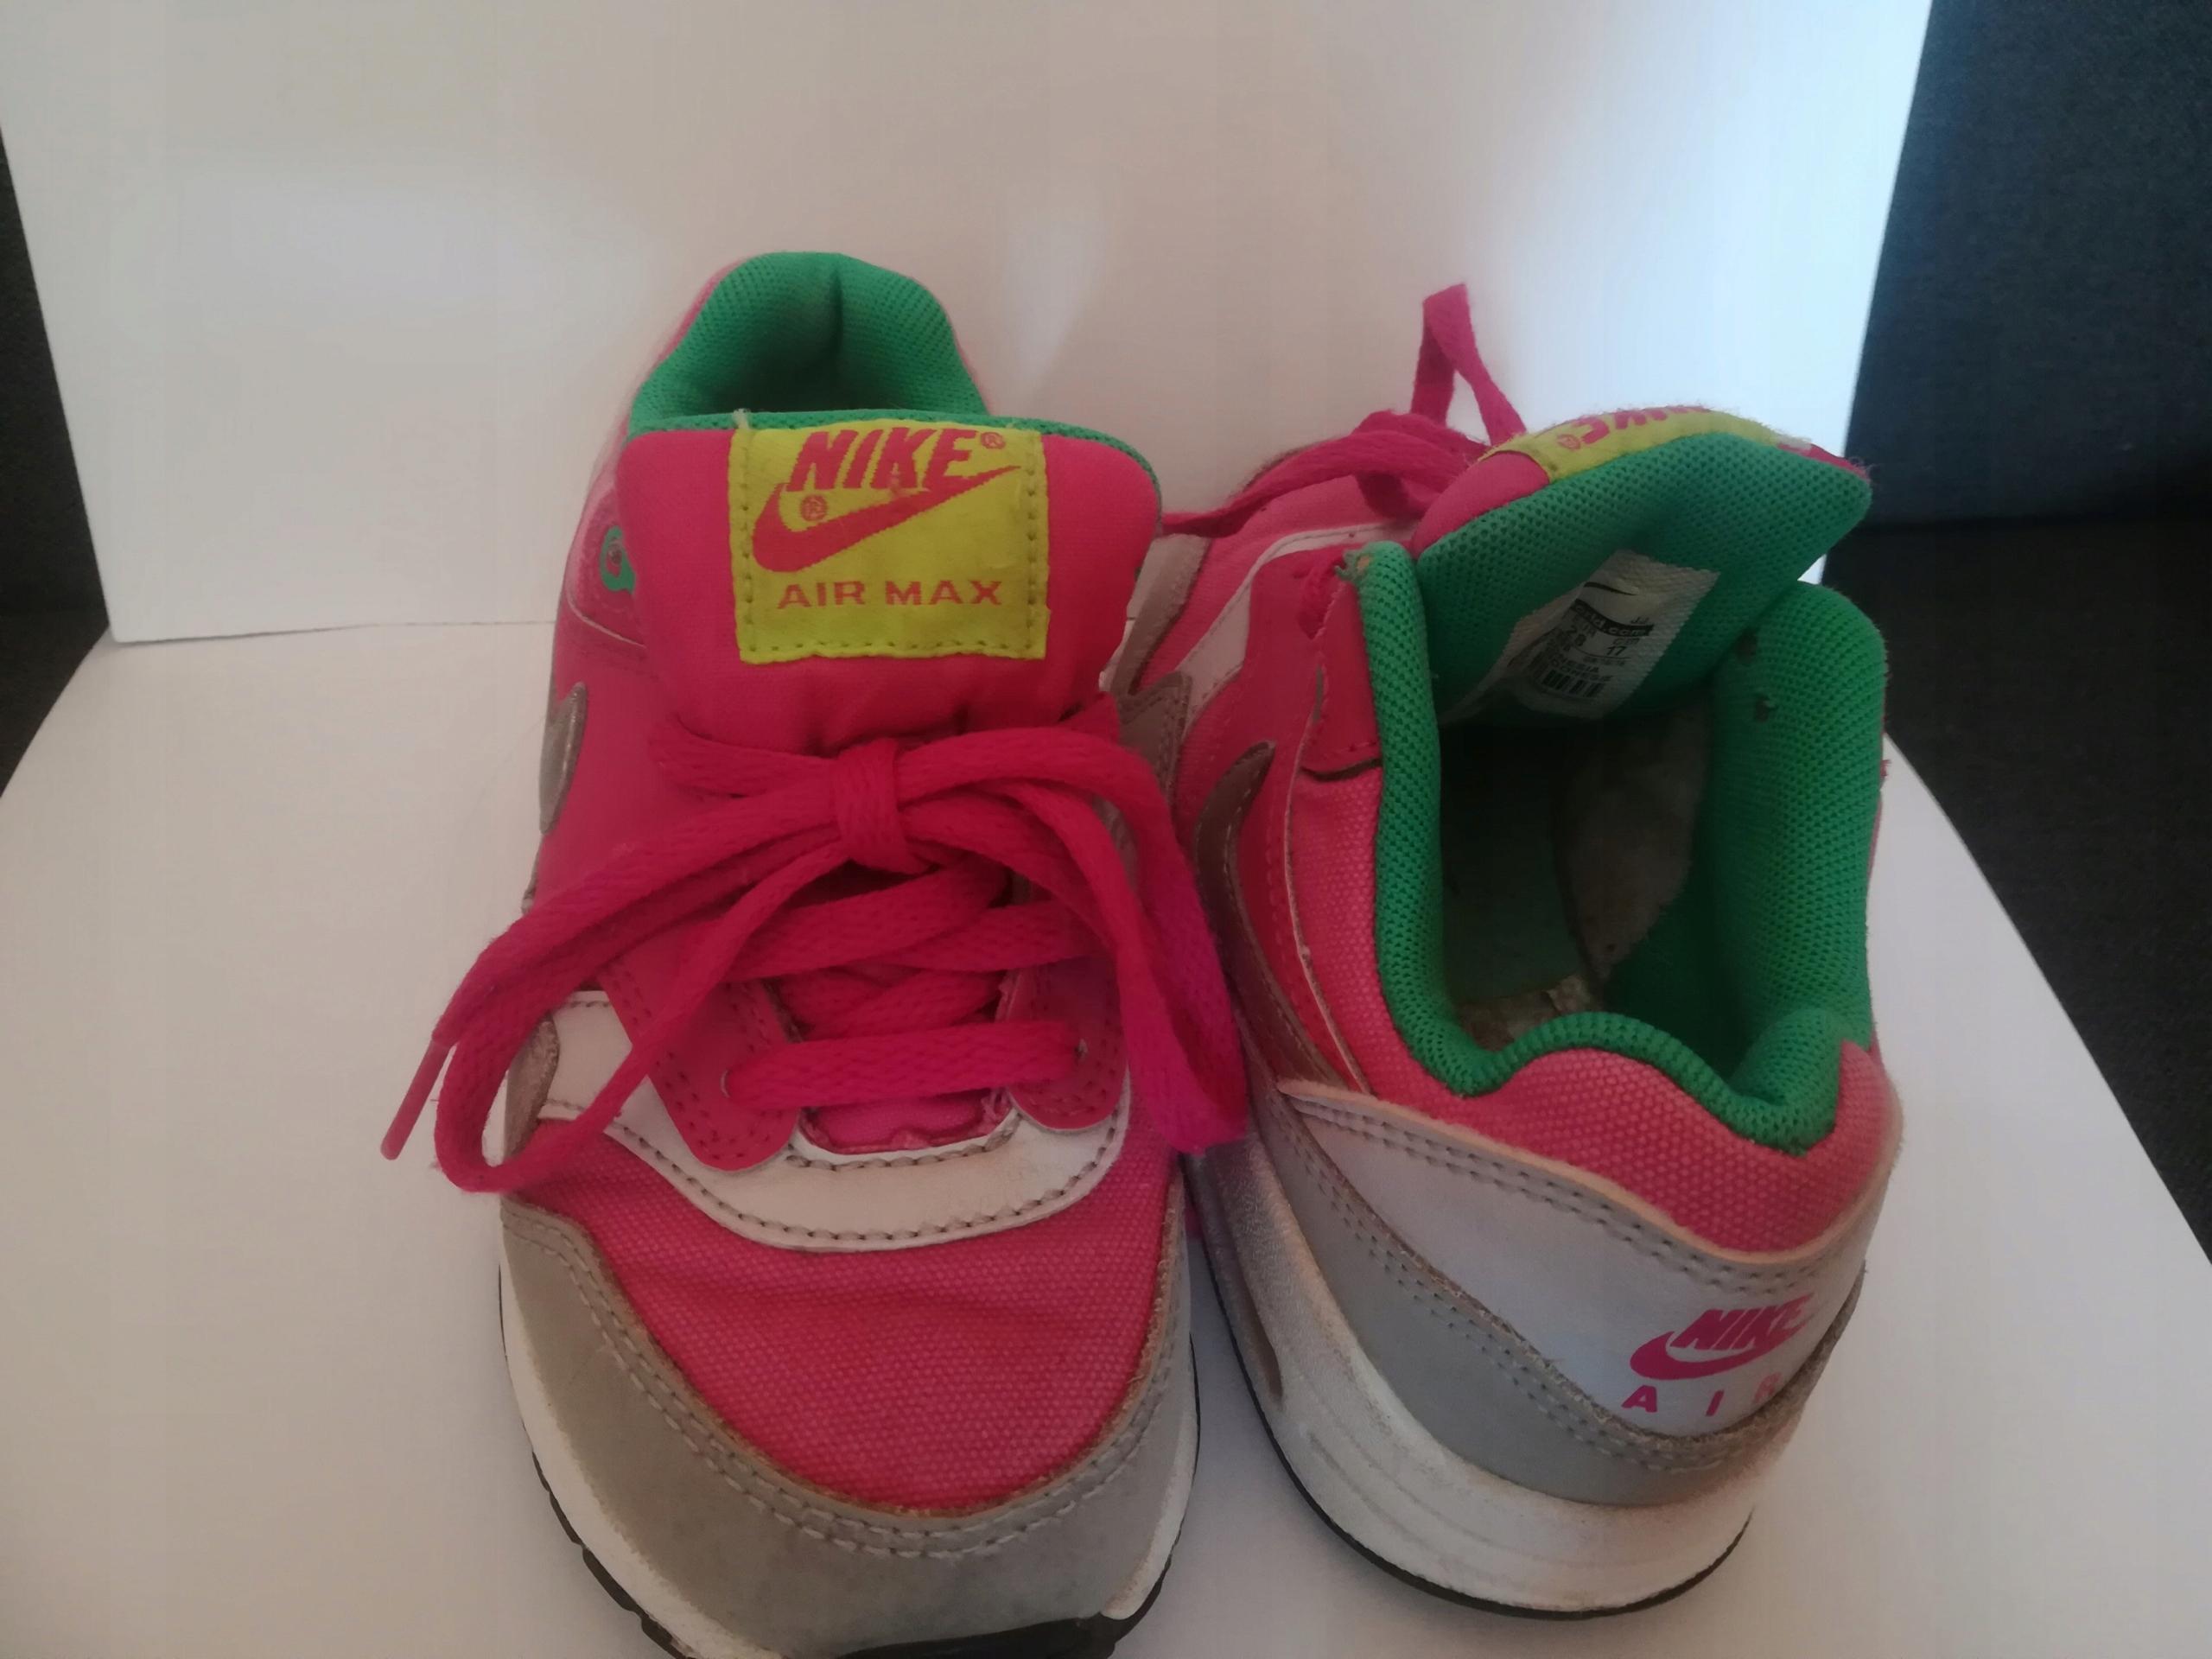 new concept 70f1b 10940 Buty Nike Air MAx, 28 dzieciece, uzywane